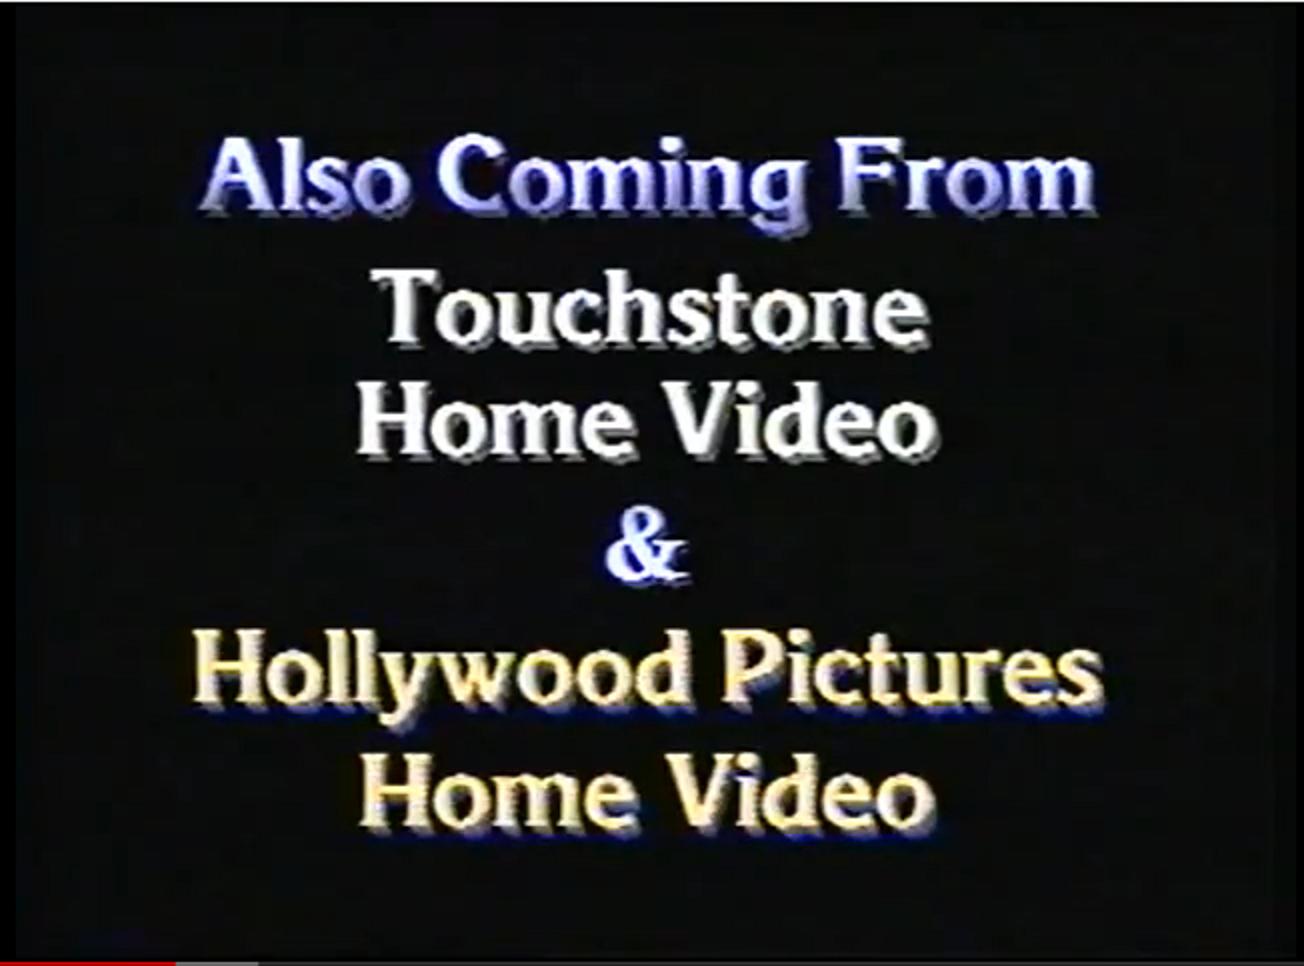 Hollywood home video Logos.